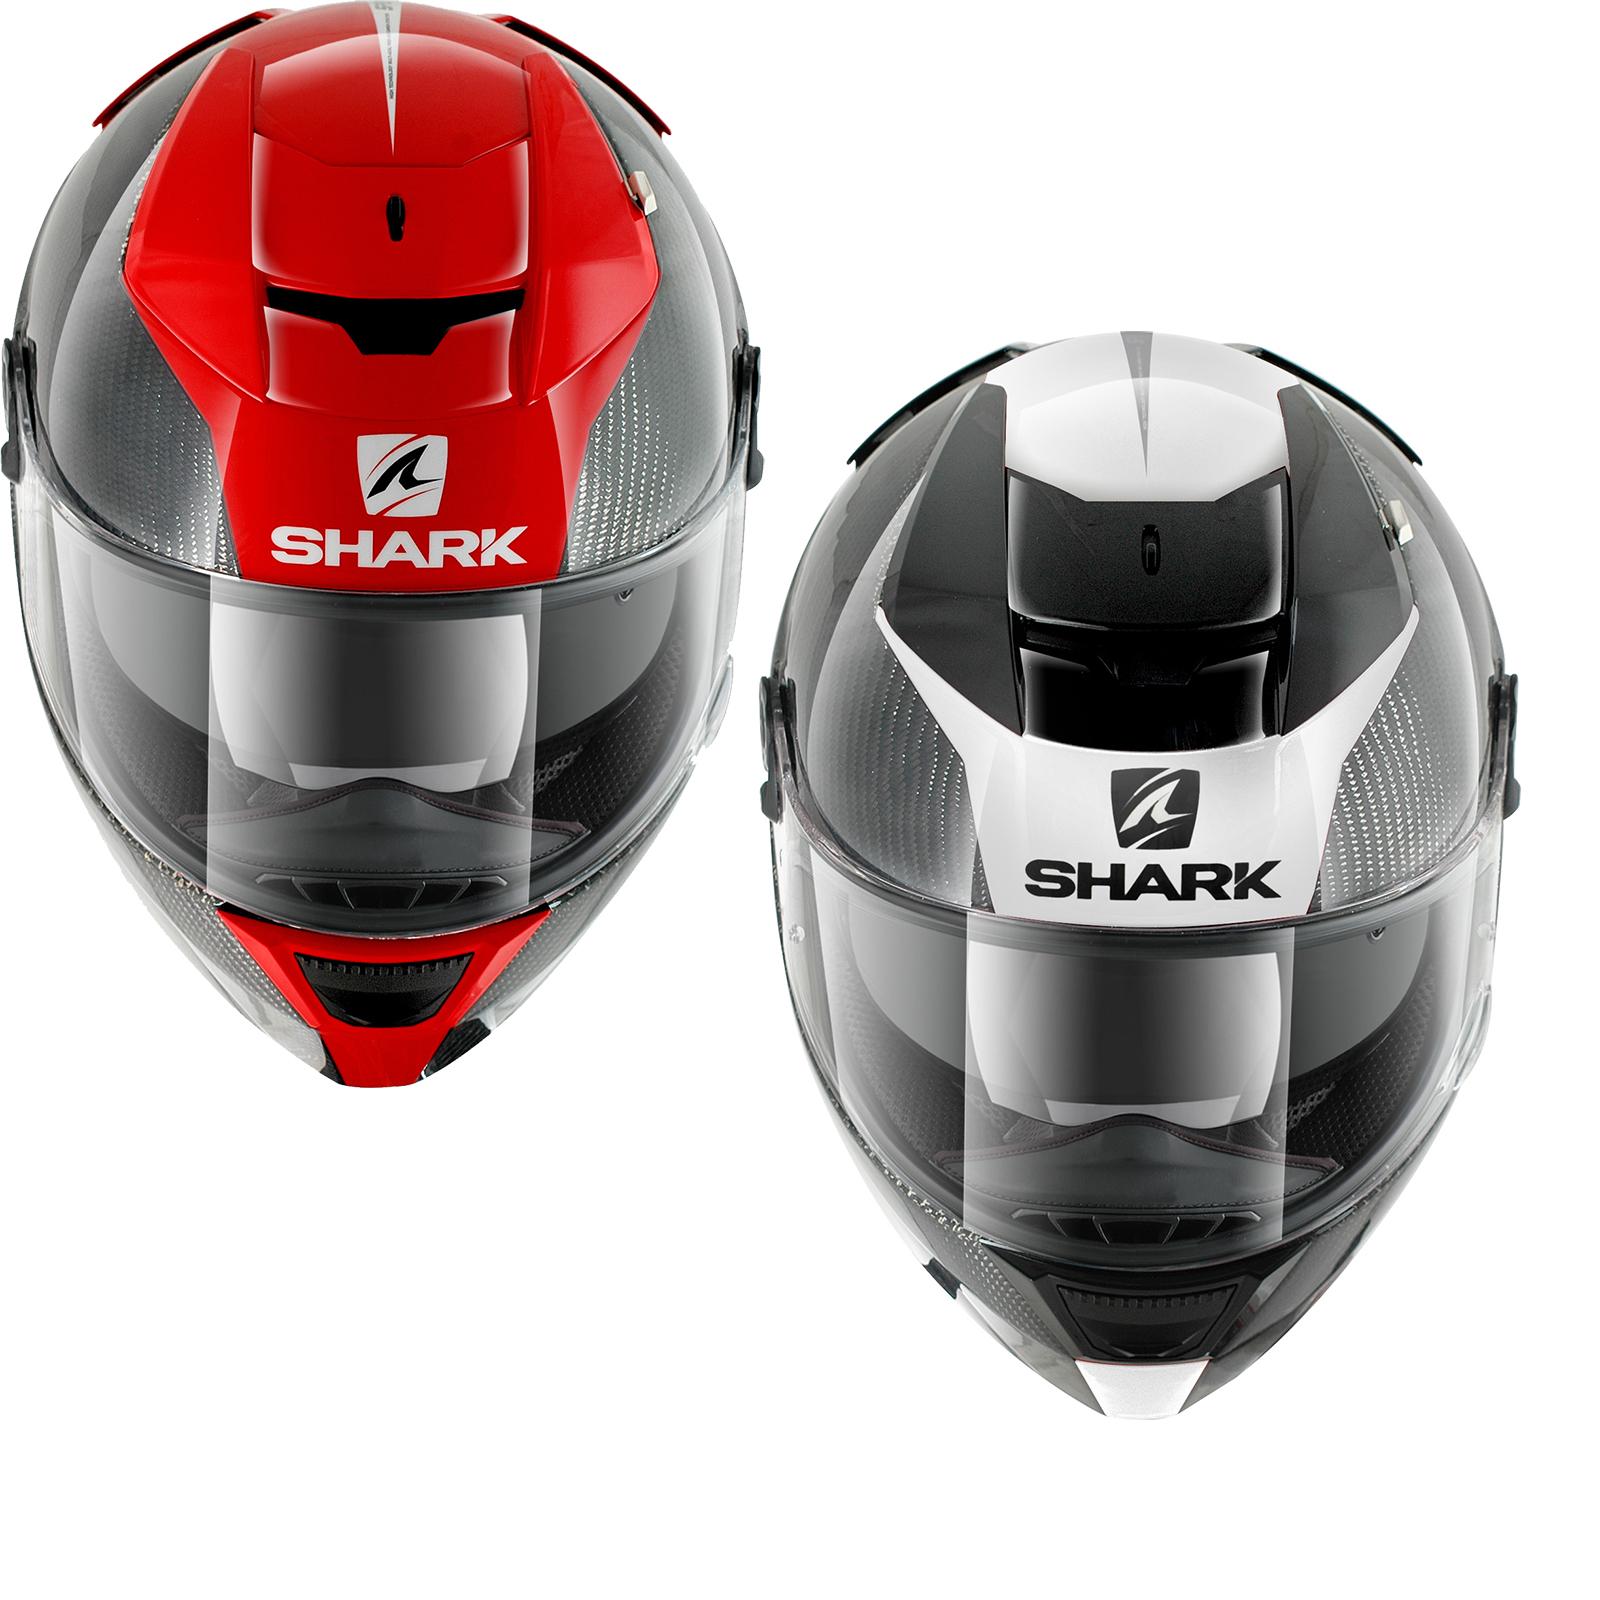 shark speed r max vision carbon skin motorcycle helmet. Black Bedroom Furniture Sets. Home Design Ideas